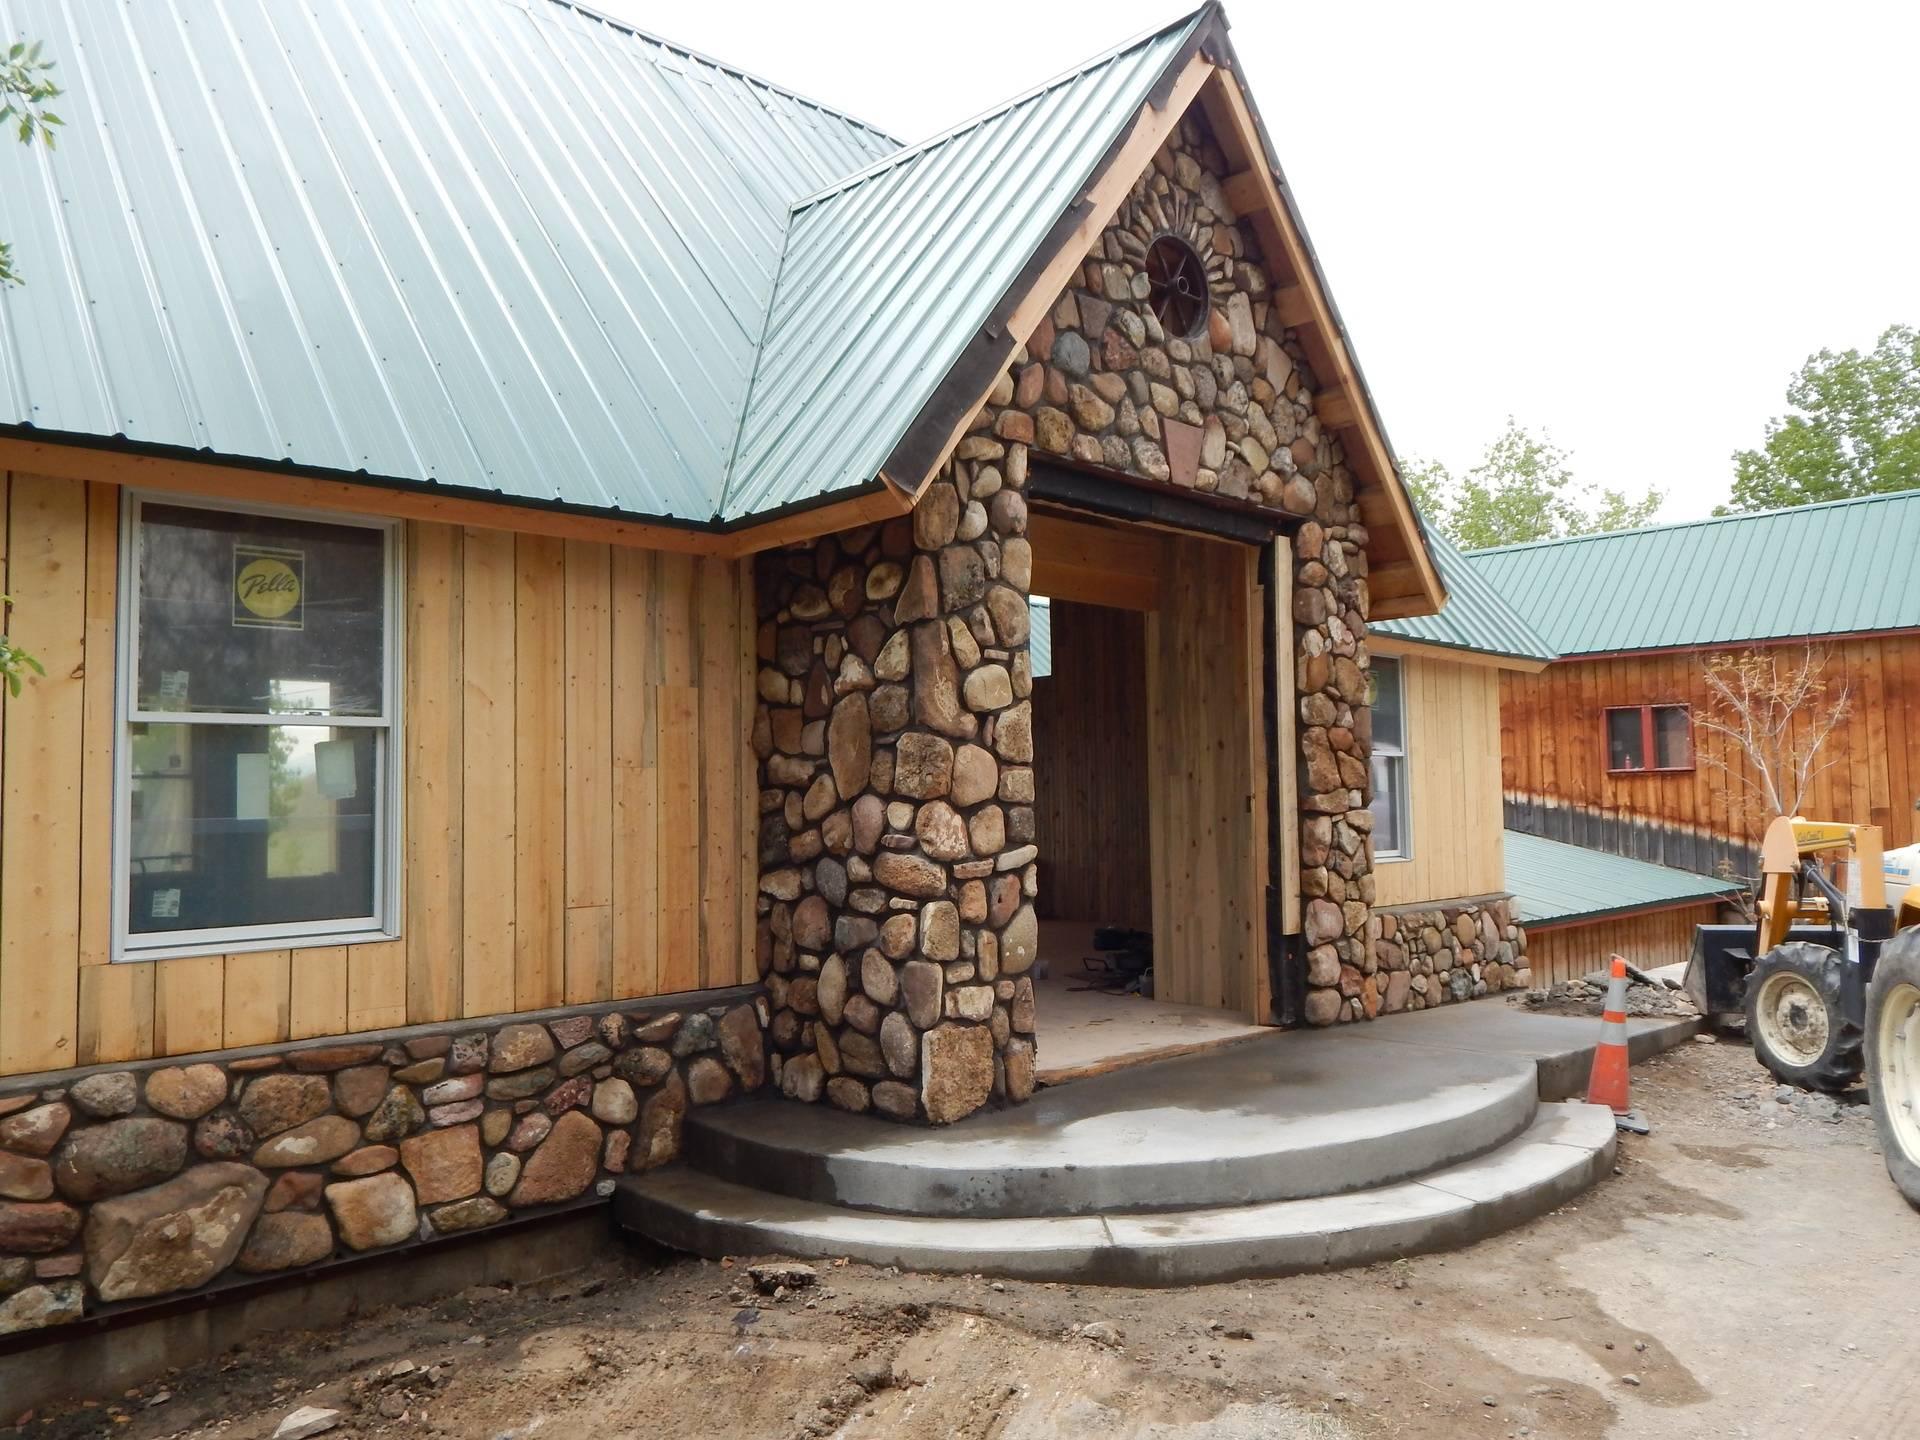 Field Stone veneer on new building at the LoneHawk Farm near Boulder Colorado